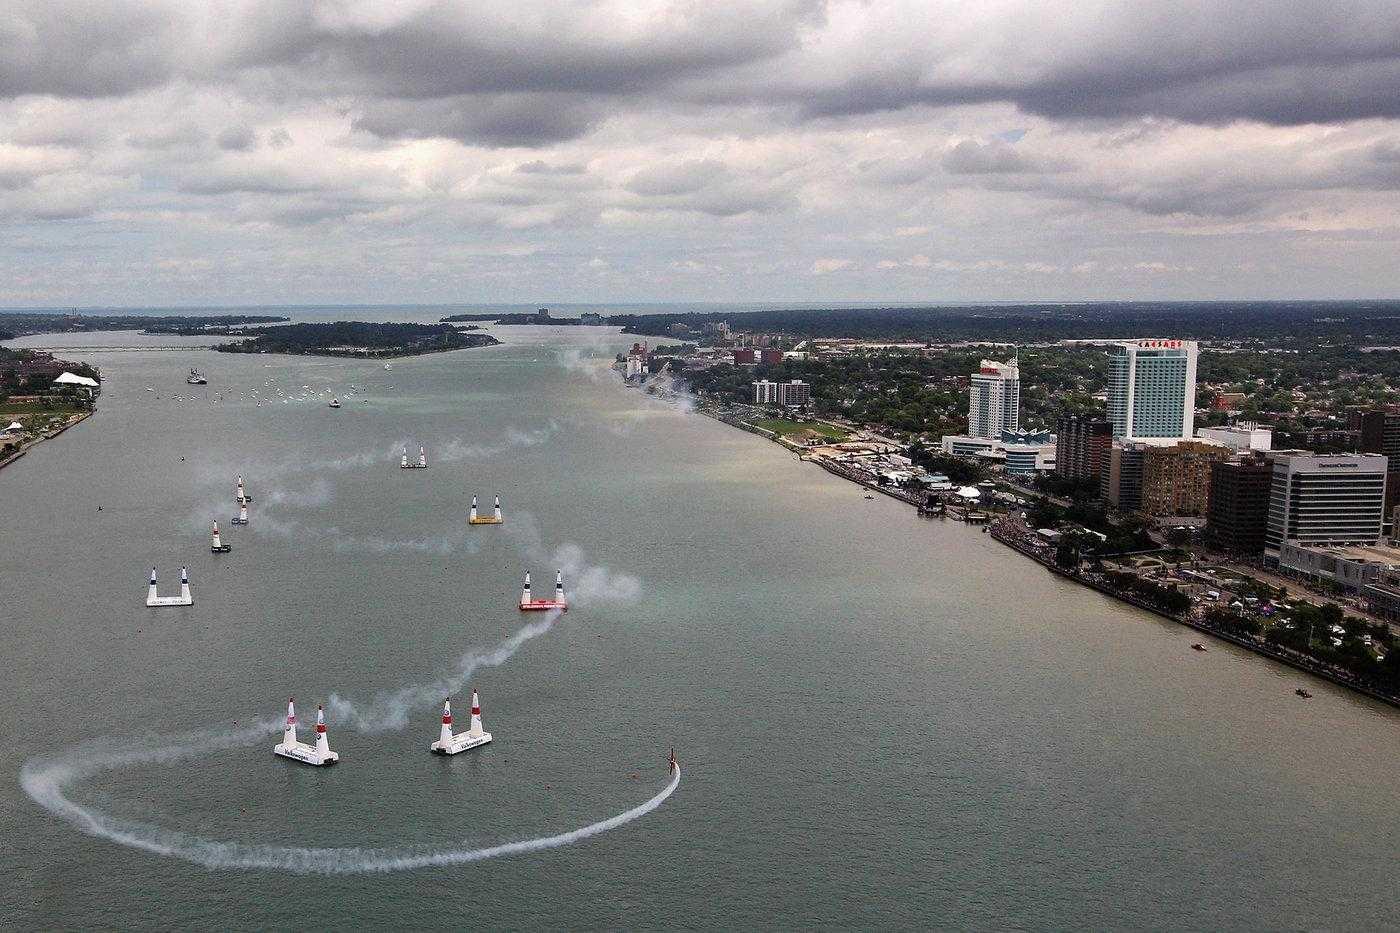 Nicolas Ivanoff - Race Day, Windsor